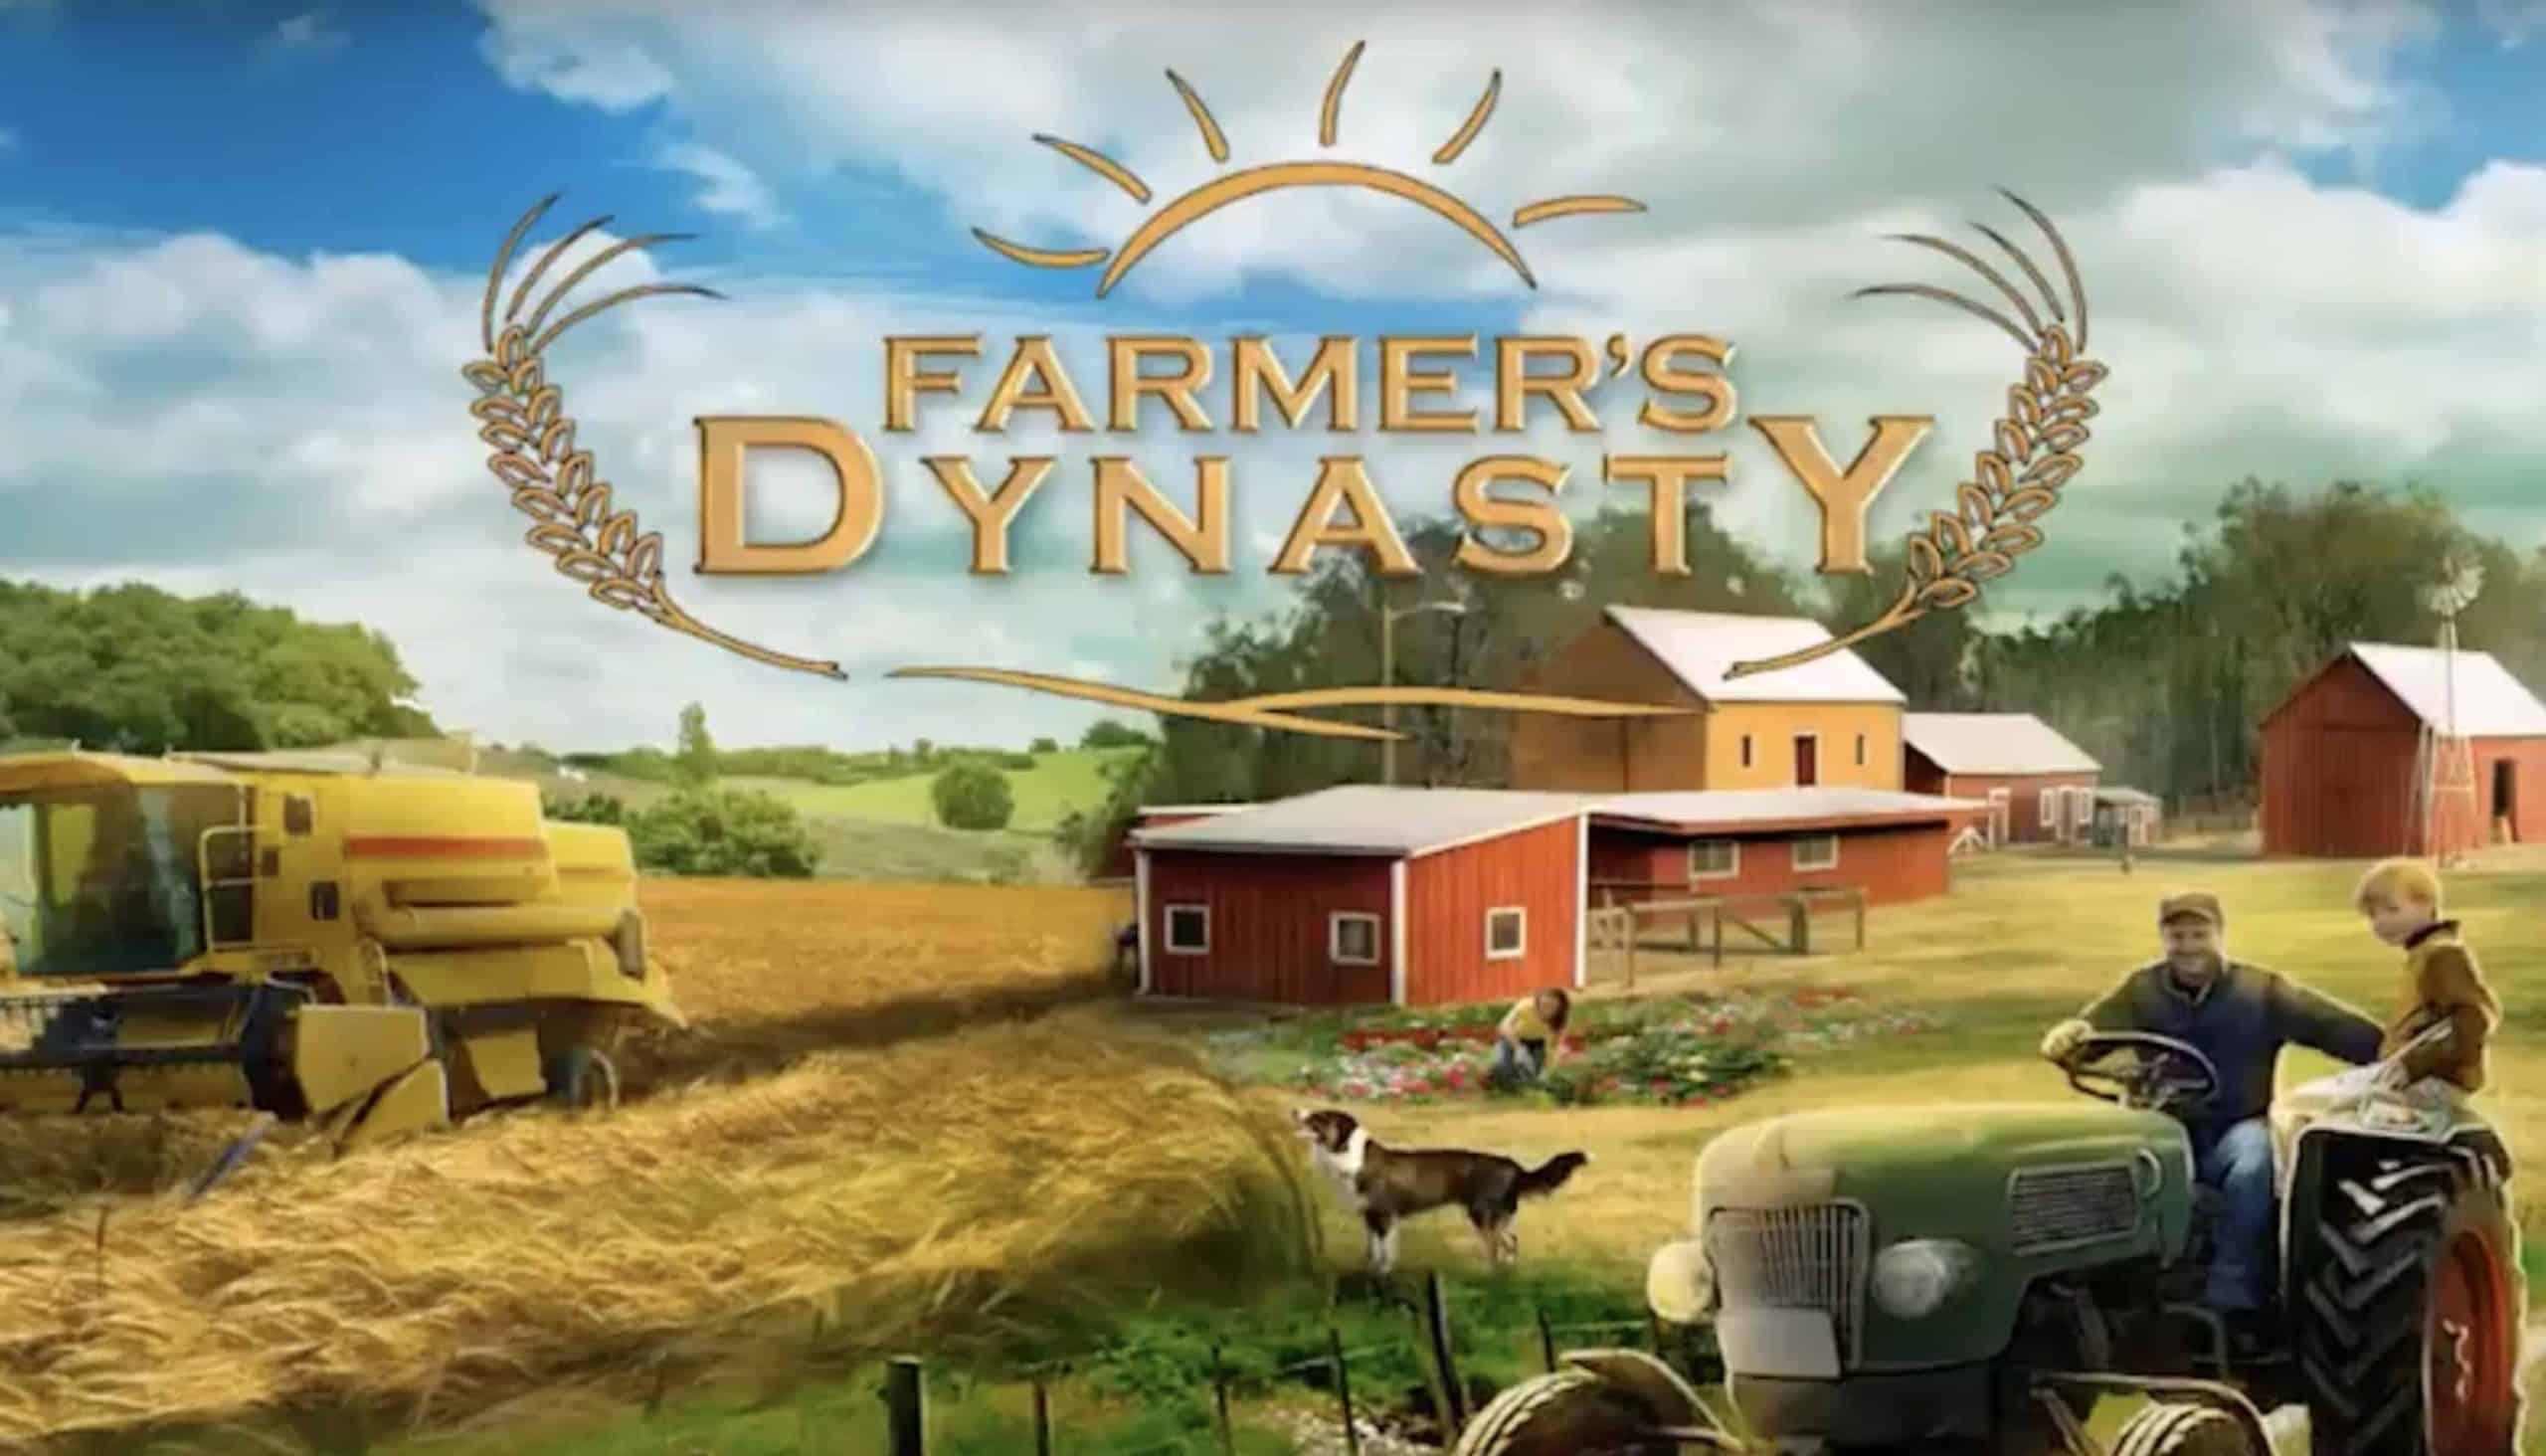 Farmers Dynasty Kostenlos herunterladen PC